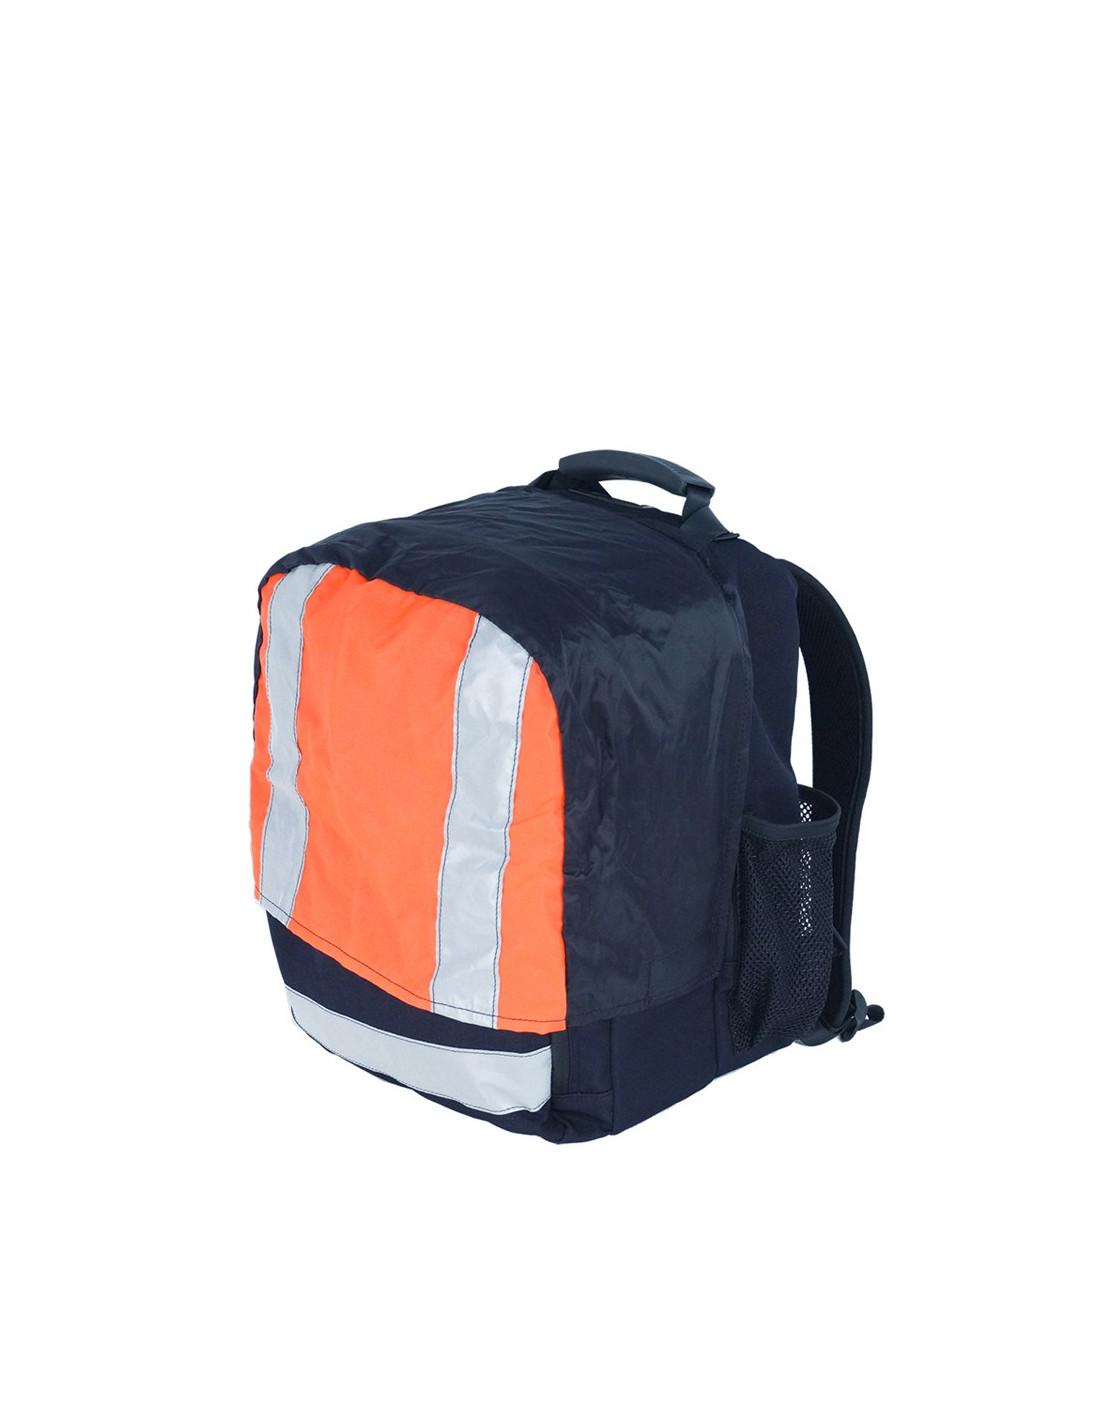 sac dos bande orange lug europa sacs pour secouristes. Black Bedroom Furniture Sets. Home Design Ideas